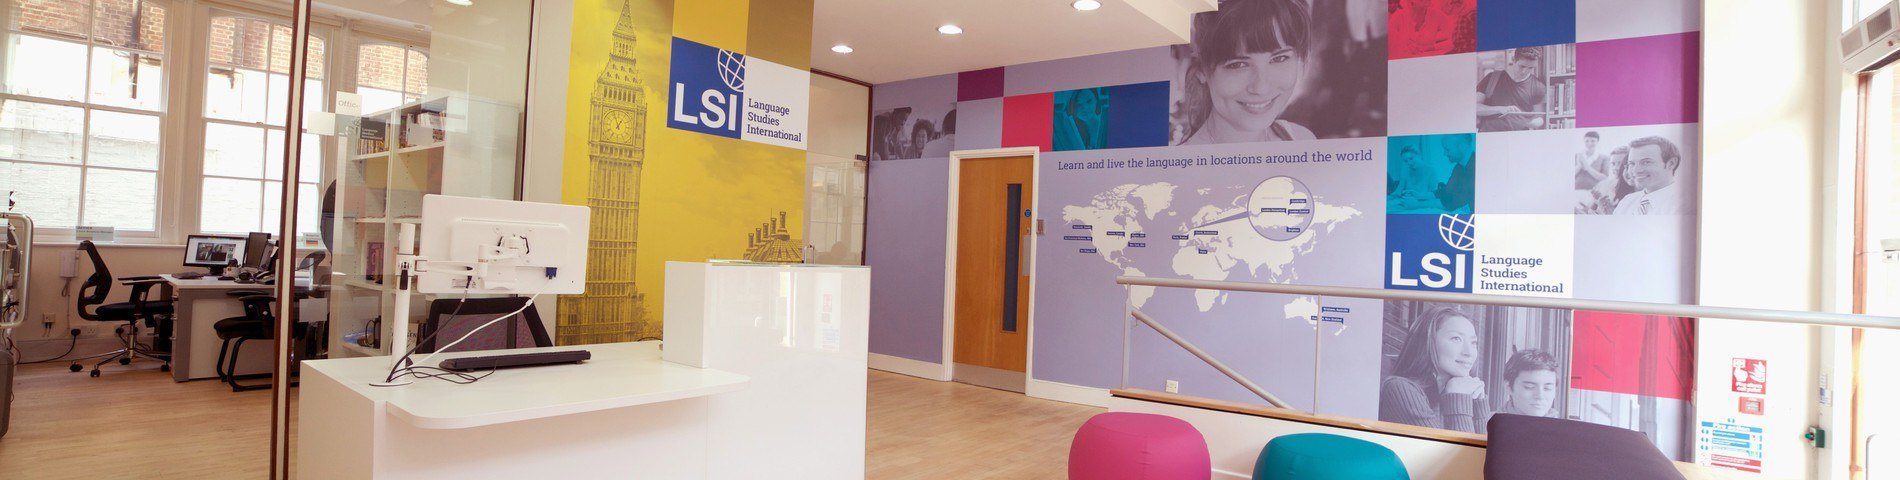 LSI - Language Studies International - Central kuva 1